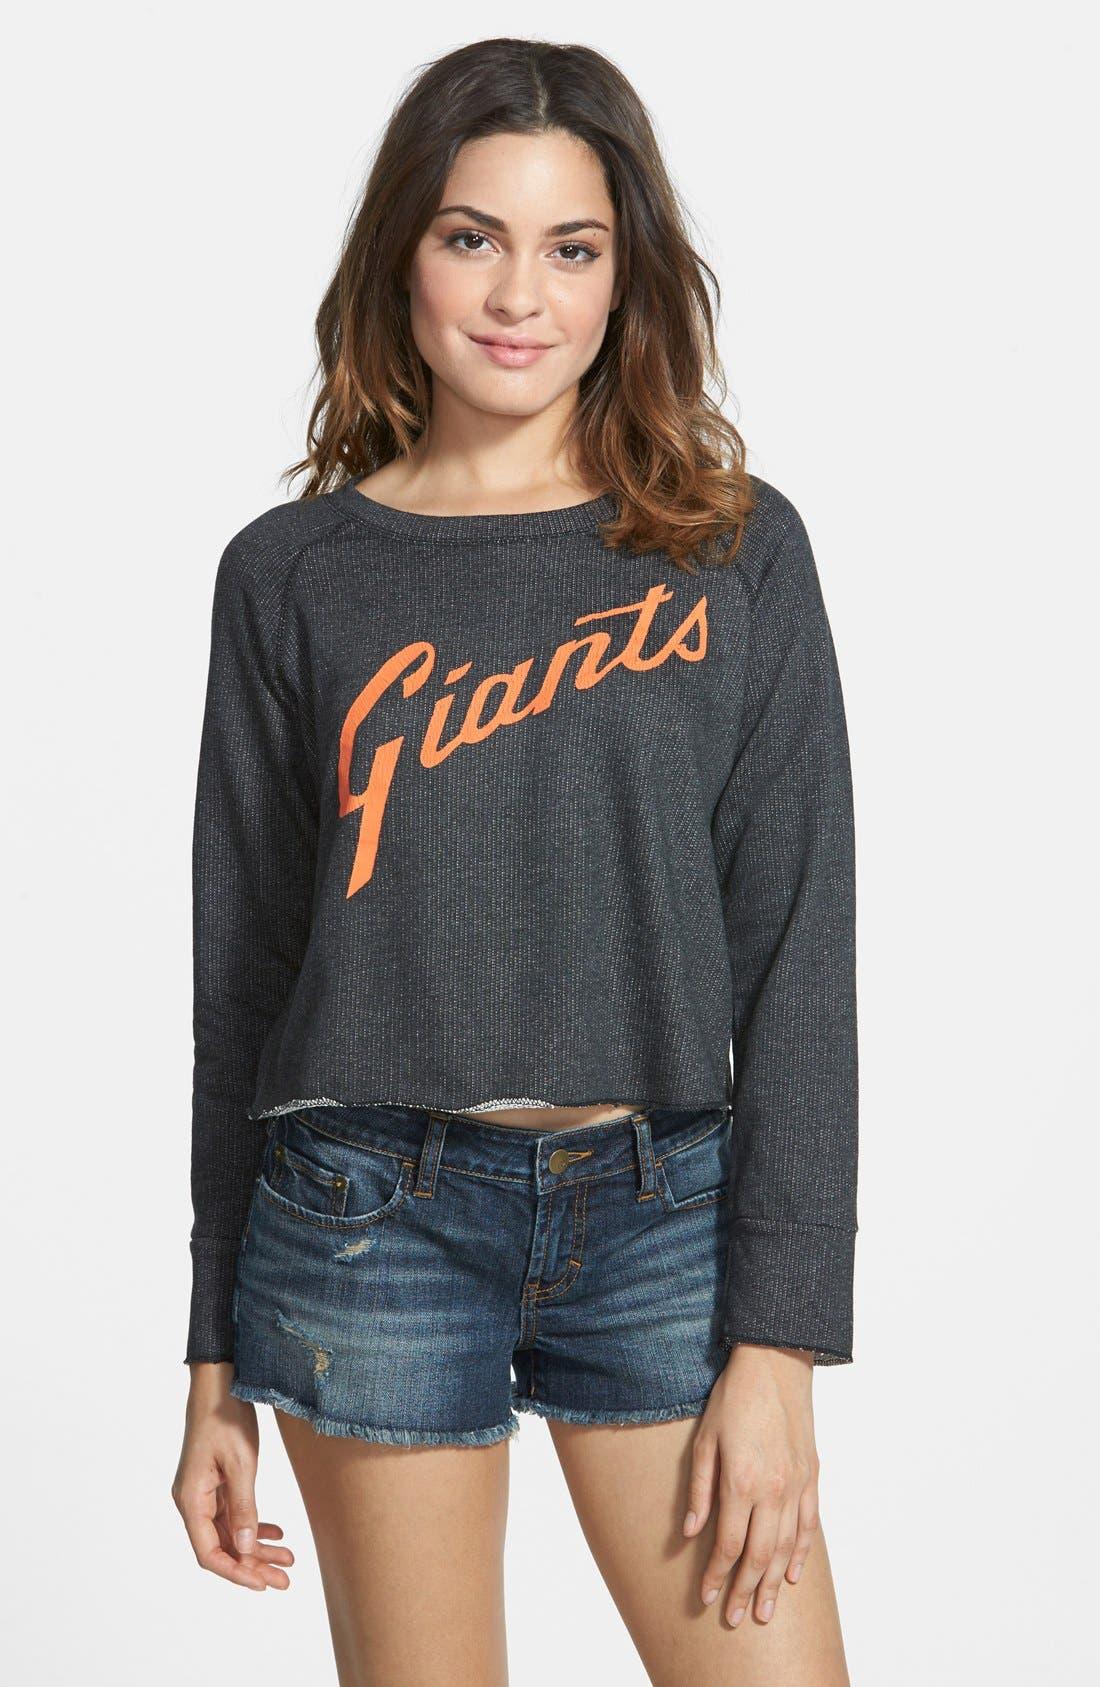 Alternate Image 1 Selected - Red Jacket 'Giants - Field Day' Crop Sweatshirt (Juniors)